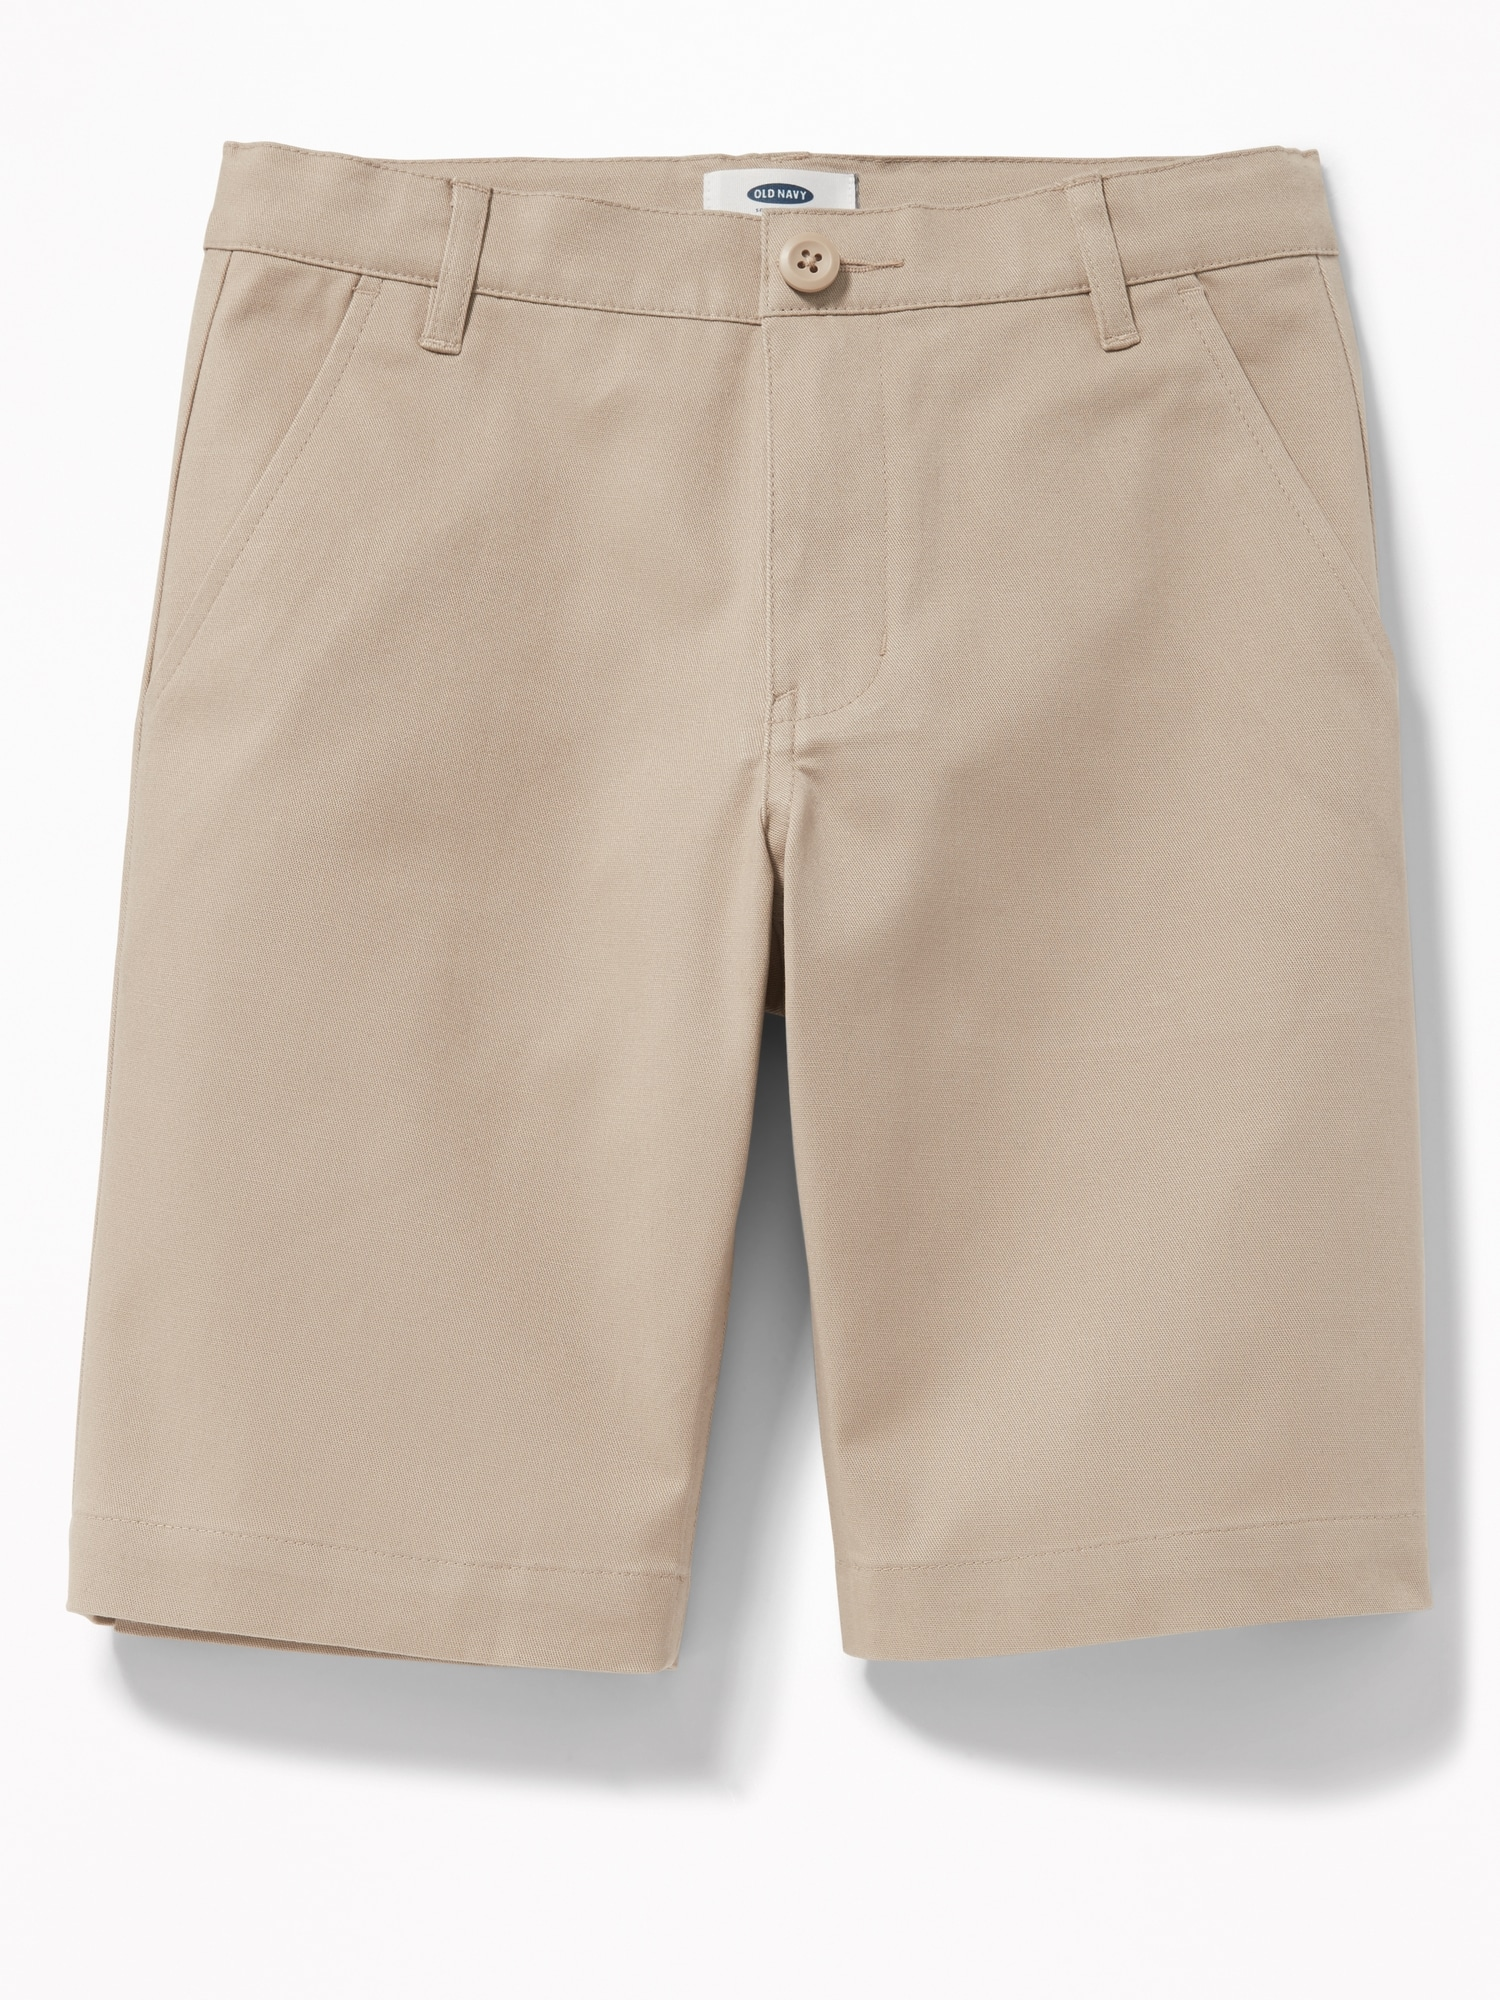 *Hot Deal* Built-In Flex Twill Straight Uniform Shorts for Boys